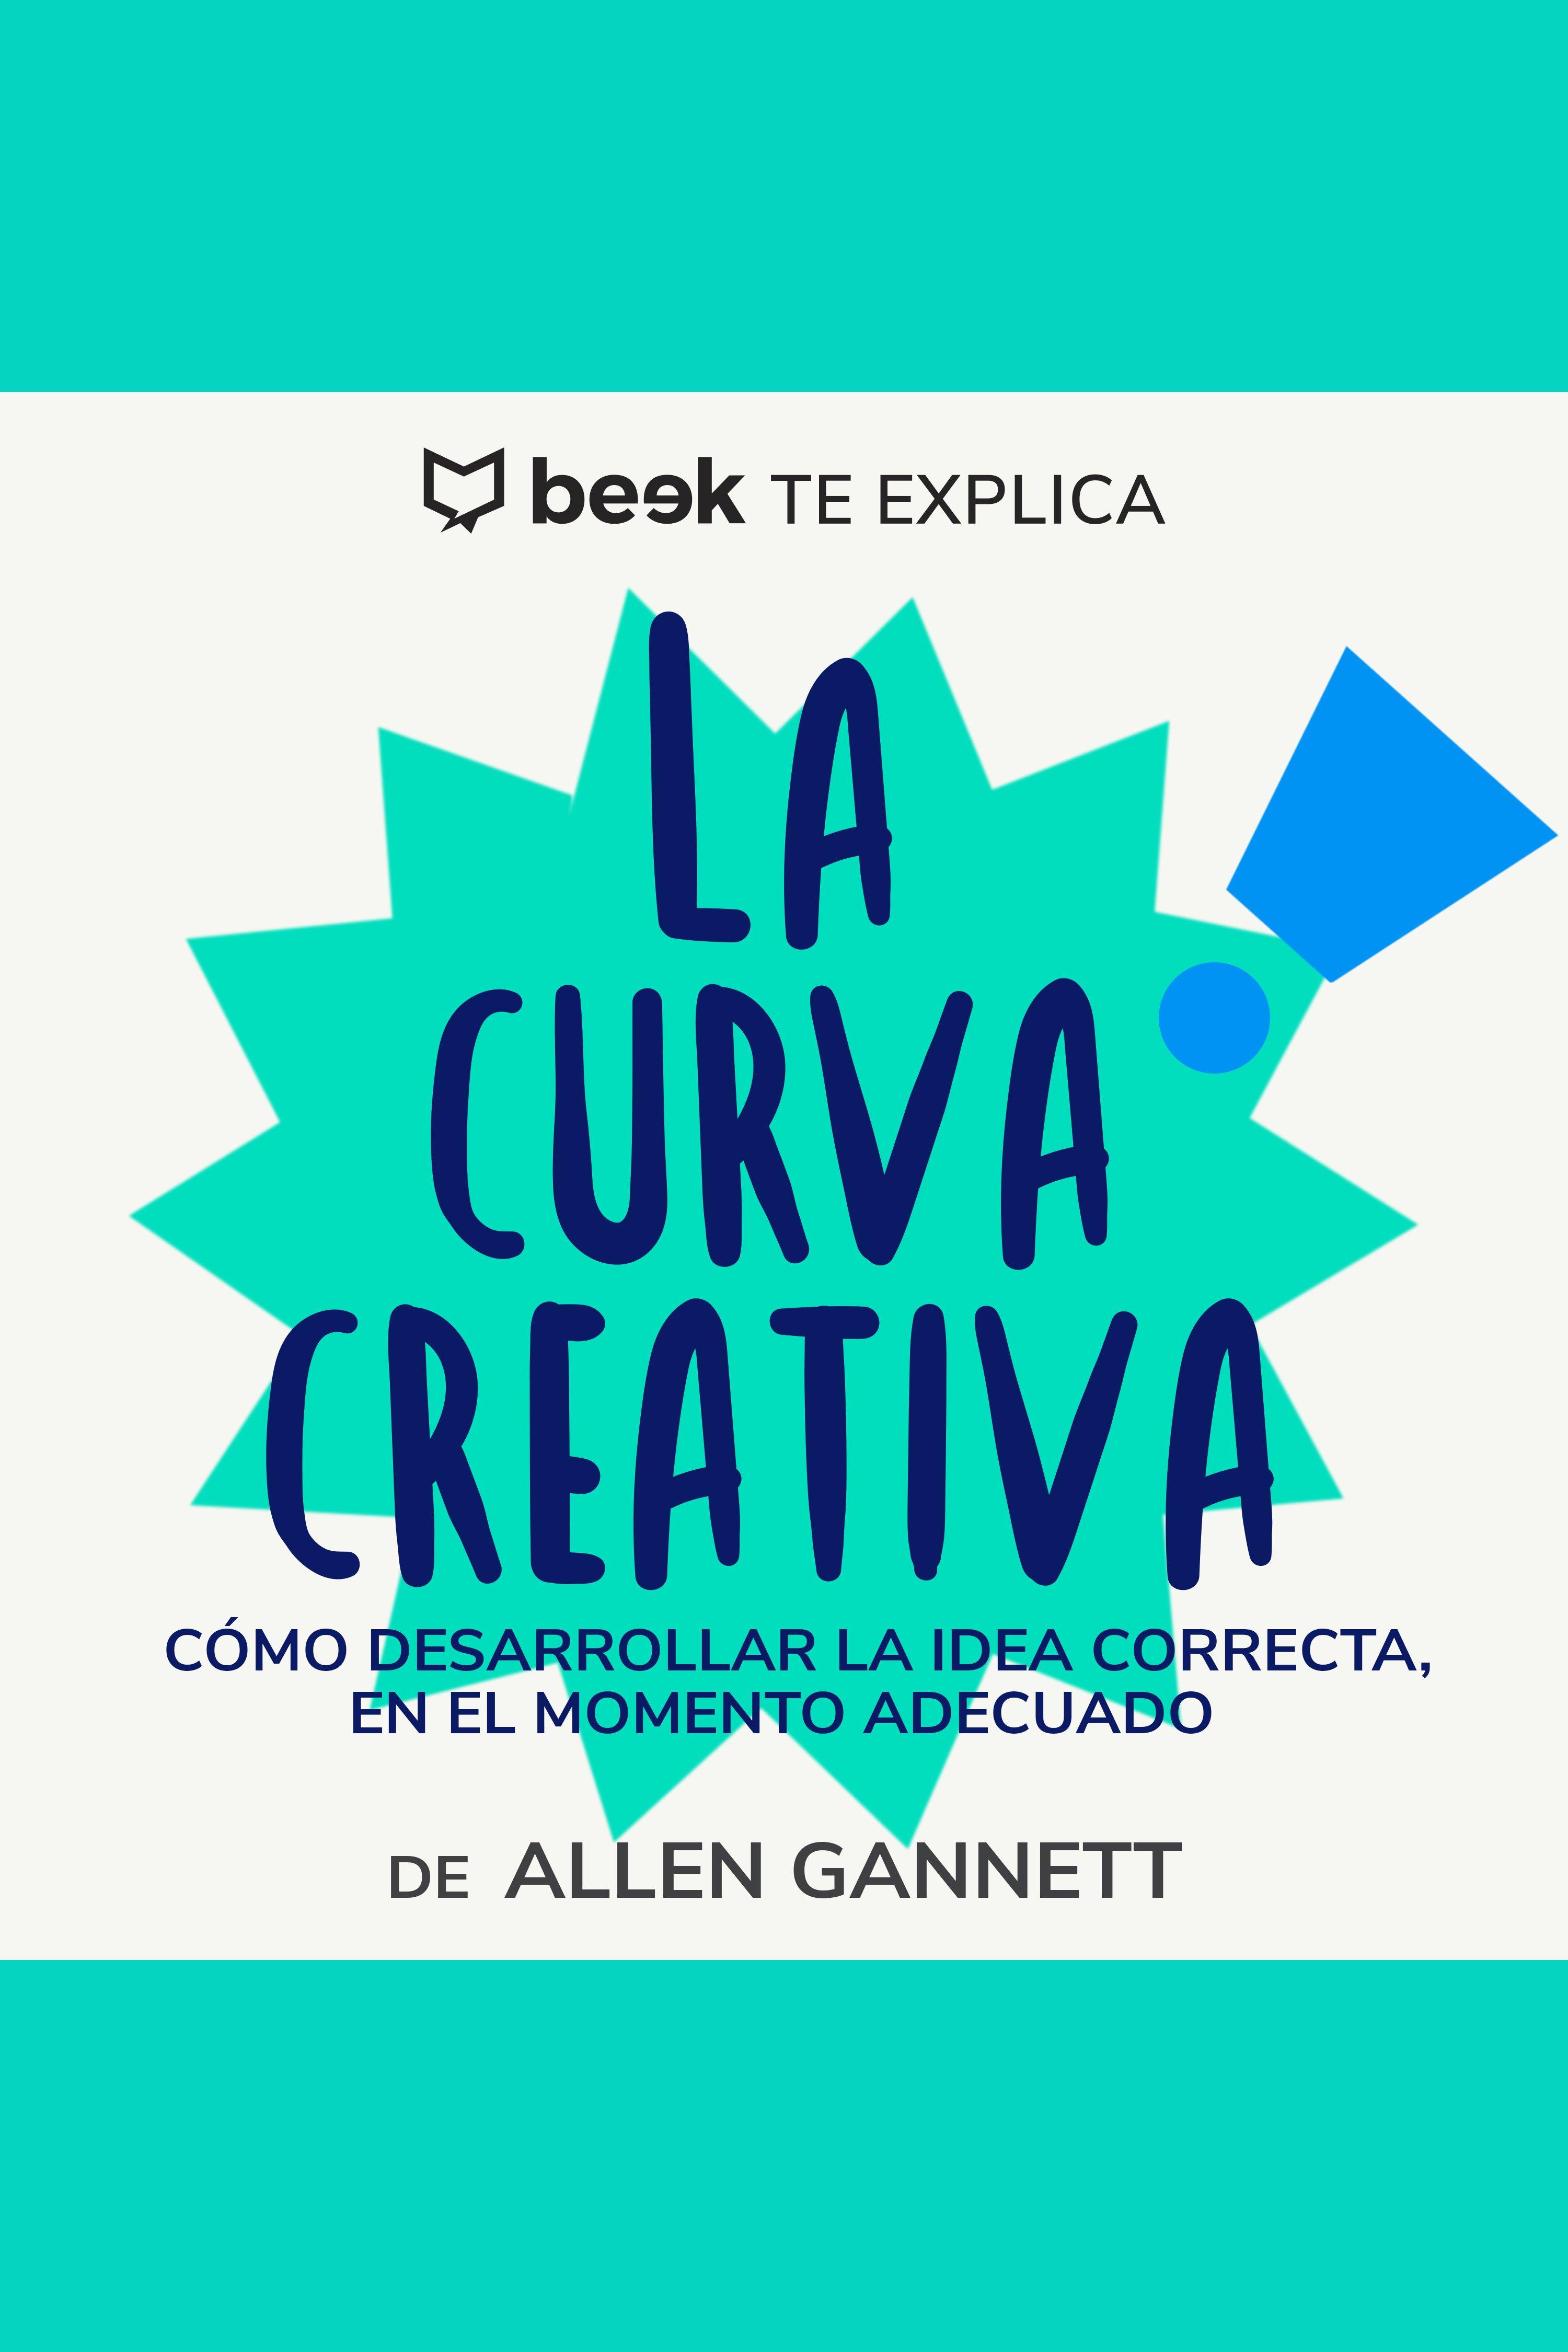 Esta es la portada del audiolibro La curva creativa… Beek te explica